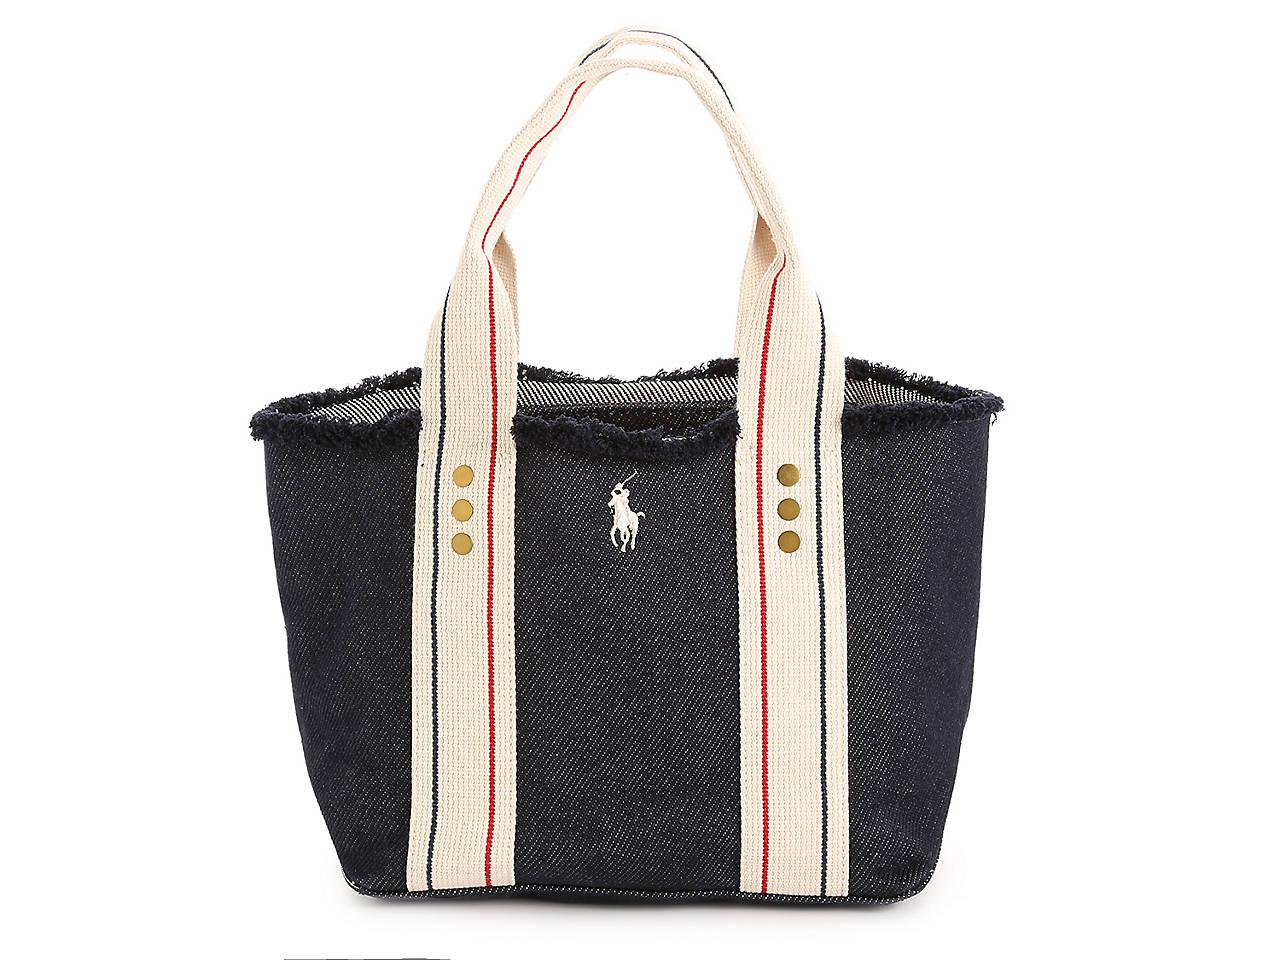 6c0f8f3b Polo Ralph Lauren Frayed Mini Tote Women's Handbags & Accessories | DSW